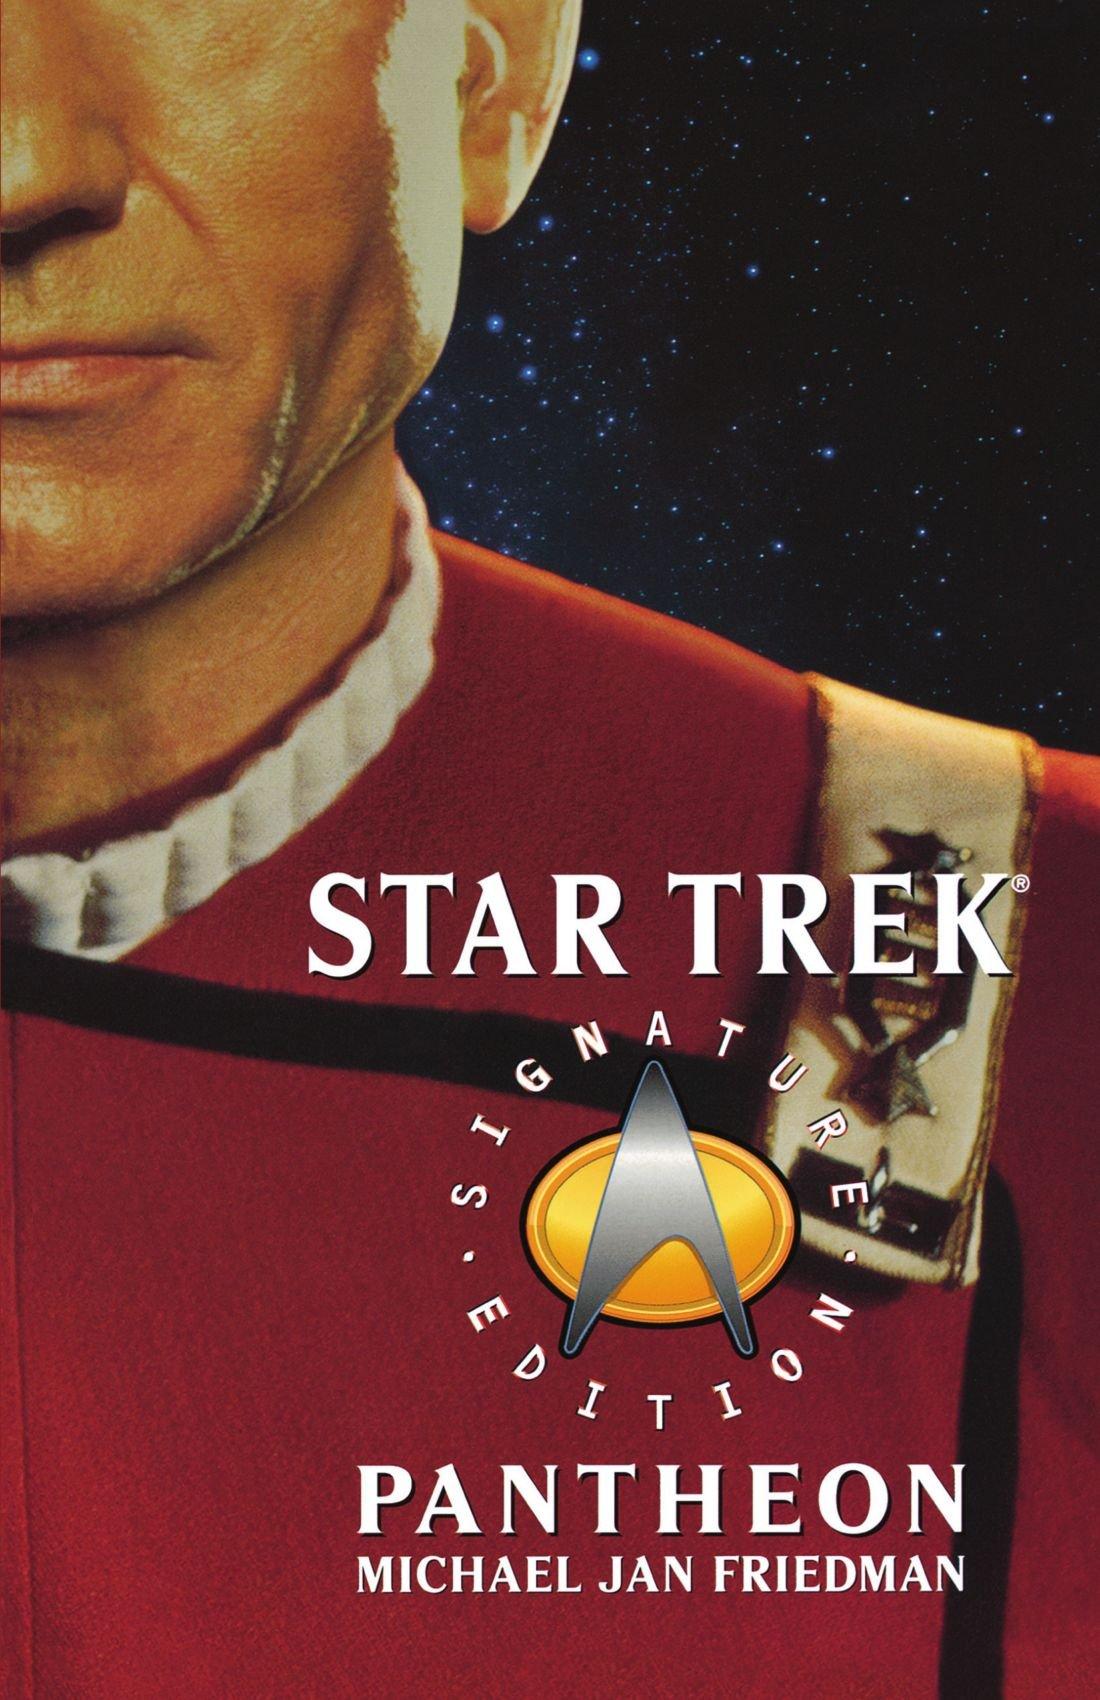 Star Trek: Pantheon, Signature Edition (Star Trek: The Original